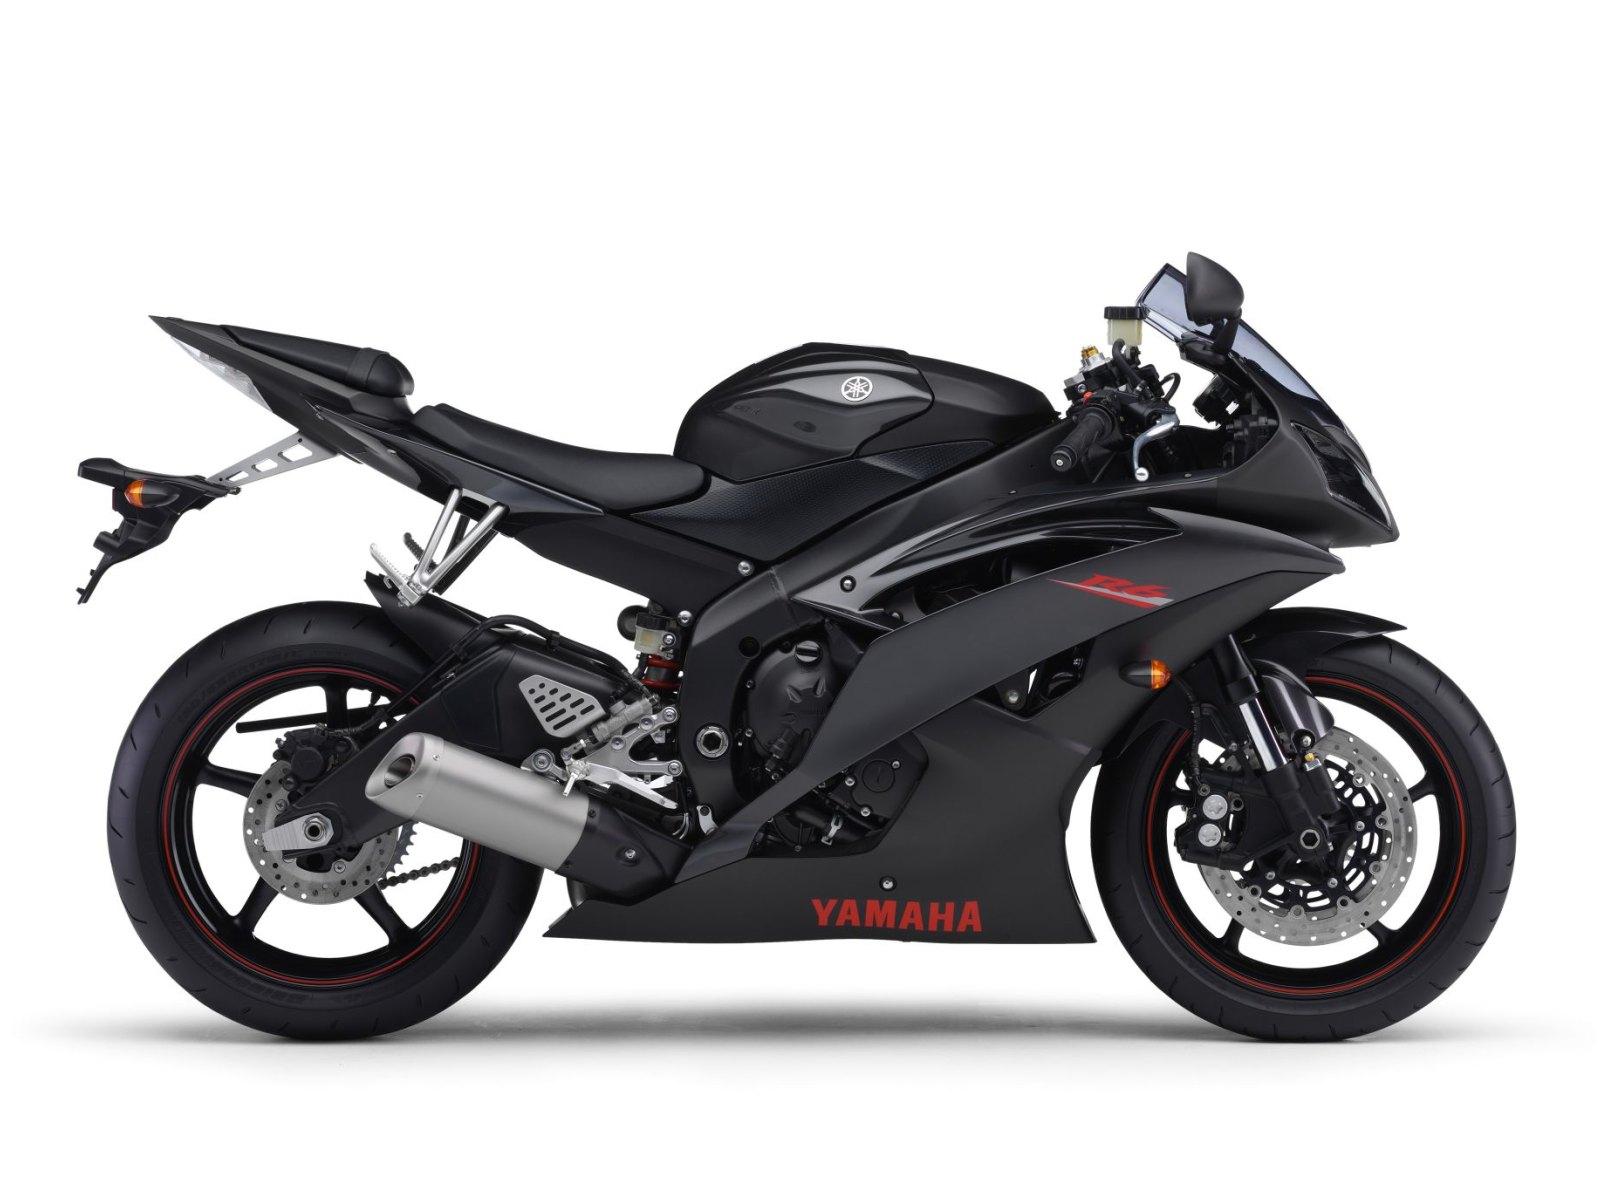 Speedy Bikes Yamaha Motor: Speedy Bikes: Yamaha Motorcycles R6